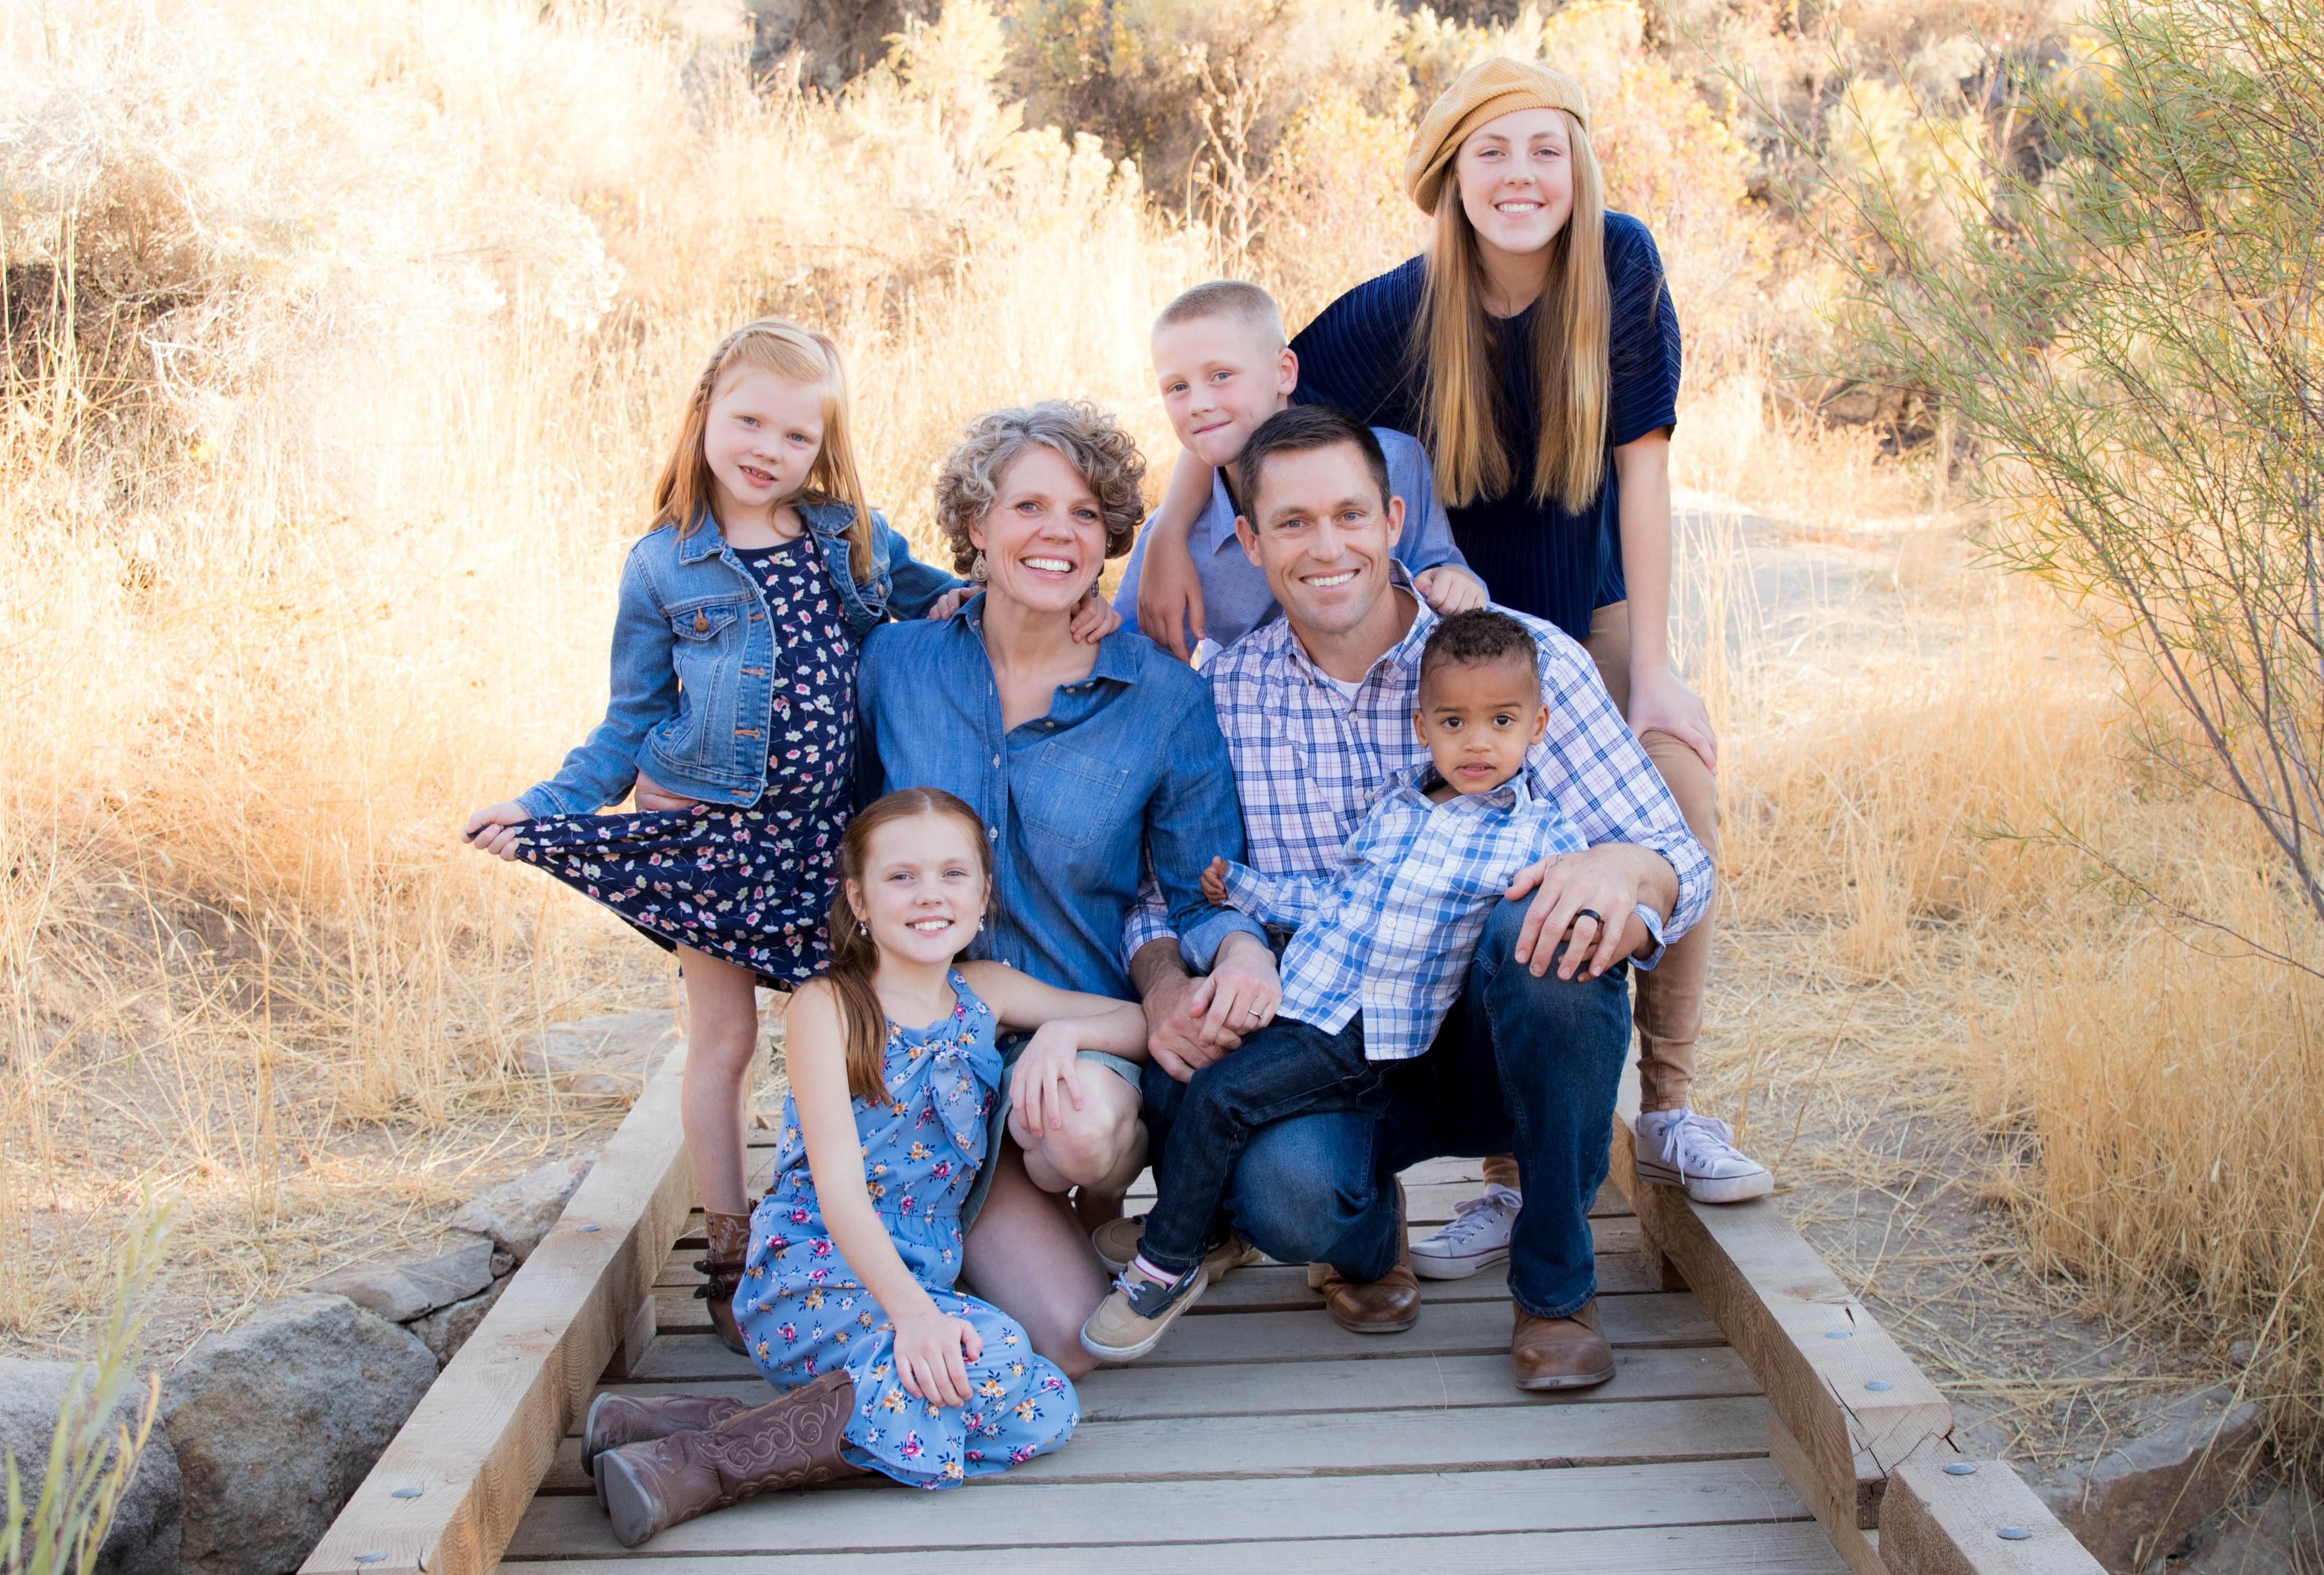 Katie Miller Family Photo 2019